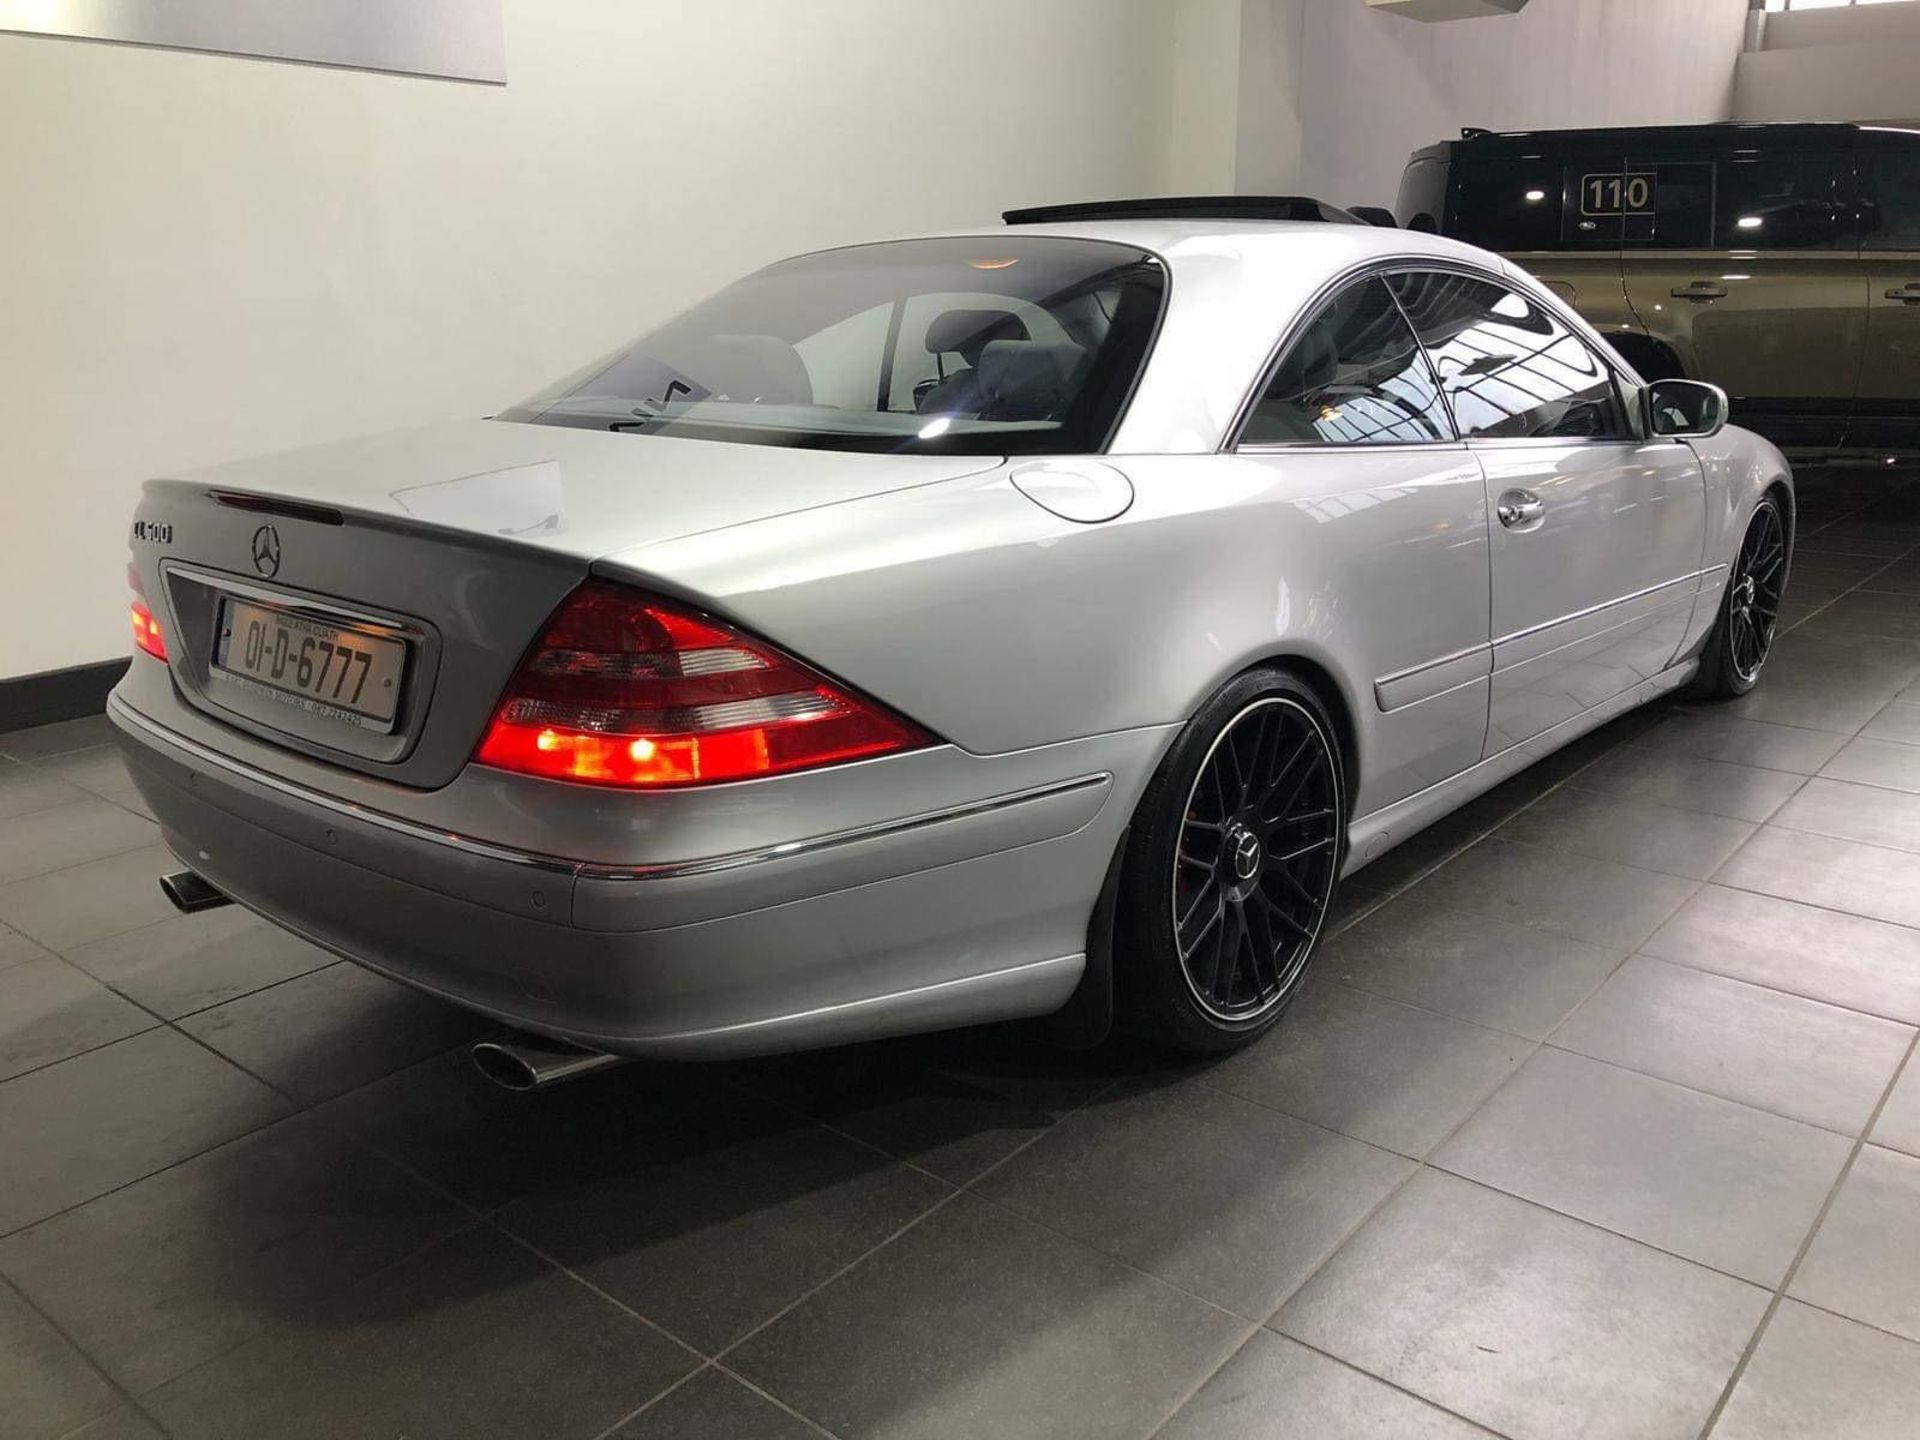 2001 Mercedes-Benz CL500 CLASS, SPORT, SOUTHERN REG, TOP SPEC, NO VAT - Image 3 of 10